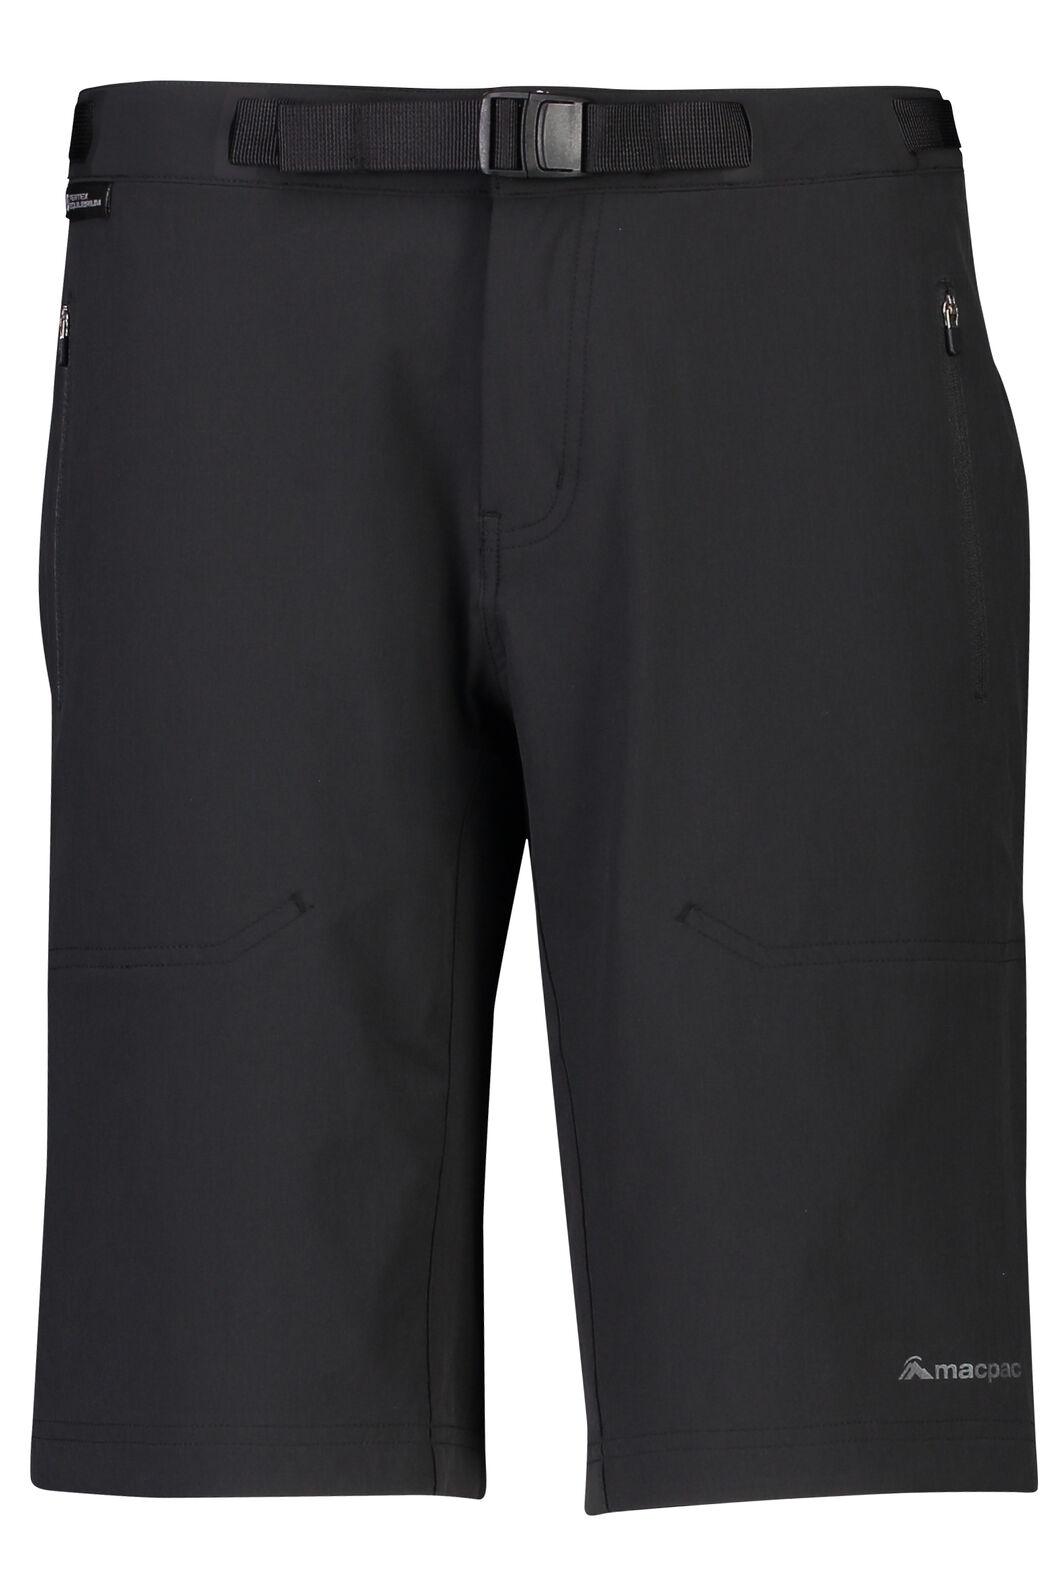 Macpac Trekker Pertex® Equilibrium Softshell Shorts - Women's, Black, hi-res